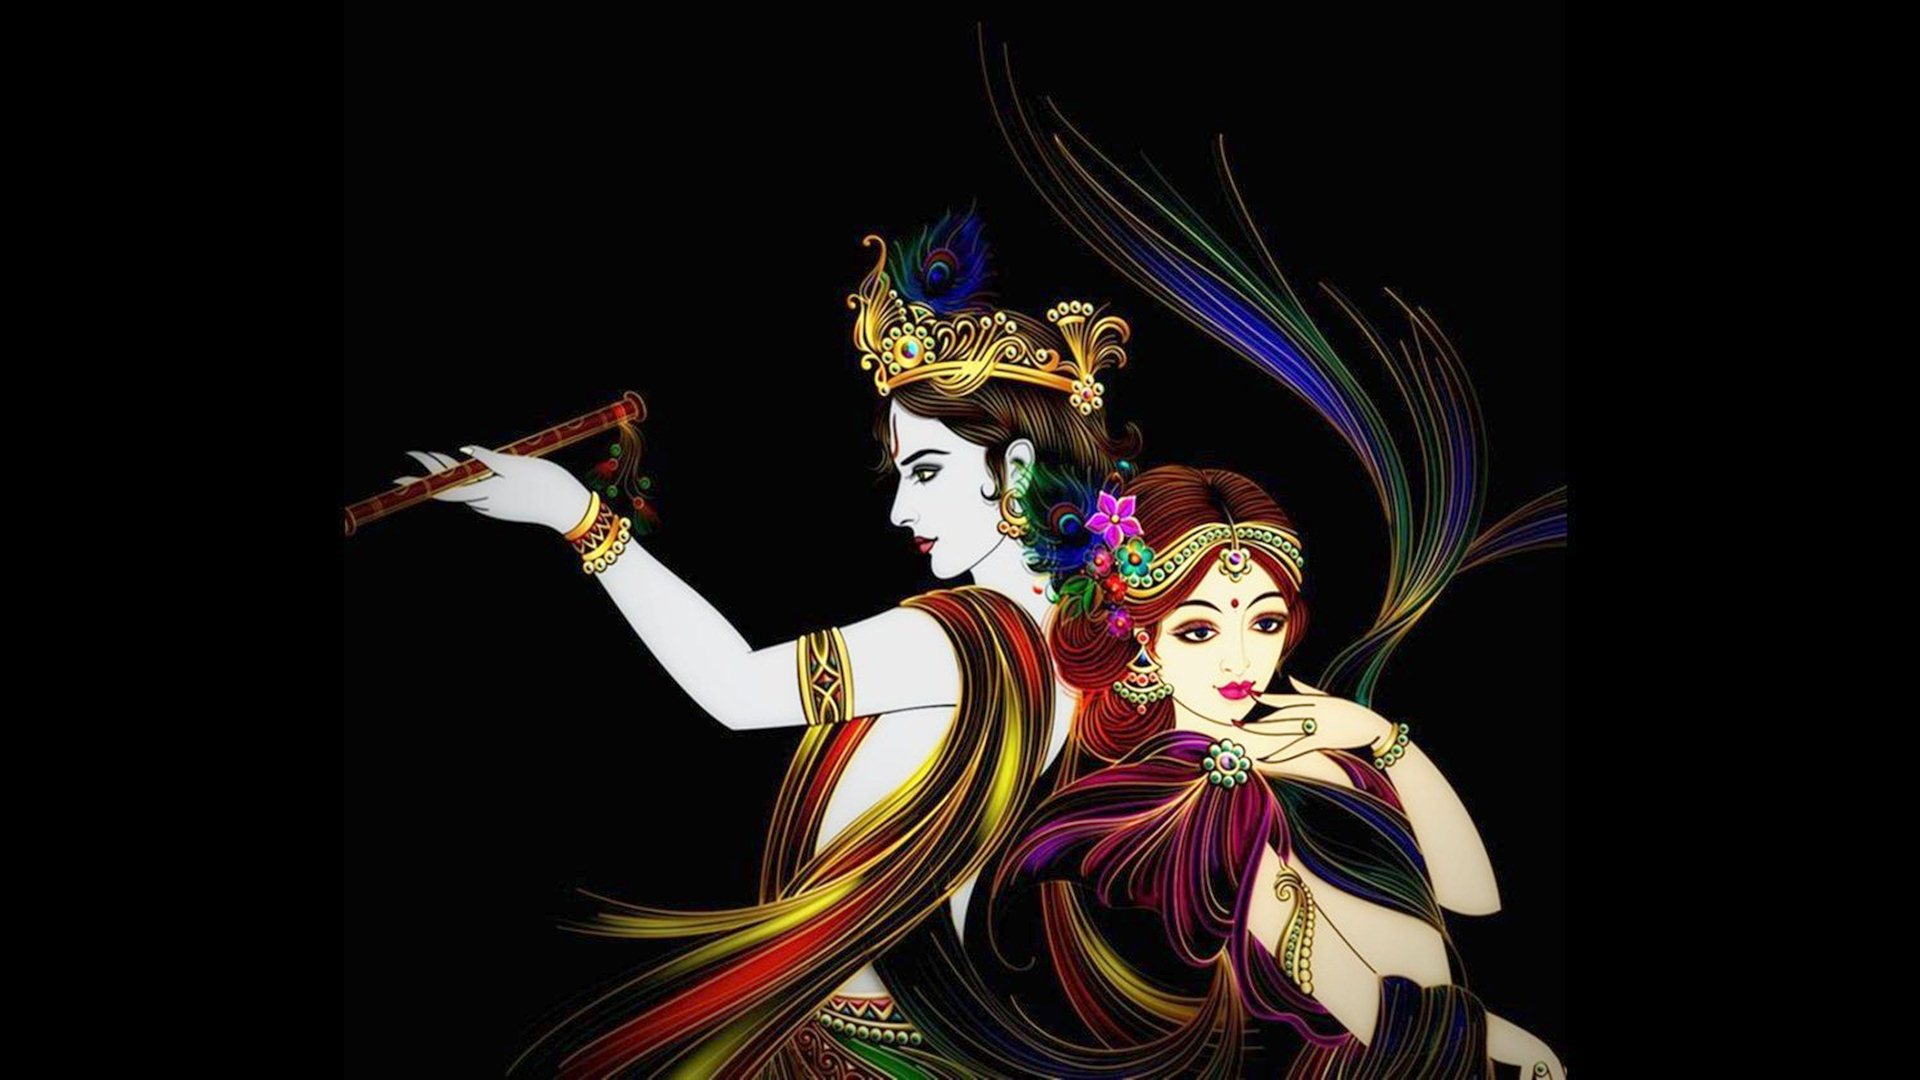 bhagwan shri krishna radha wallpaper